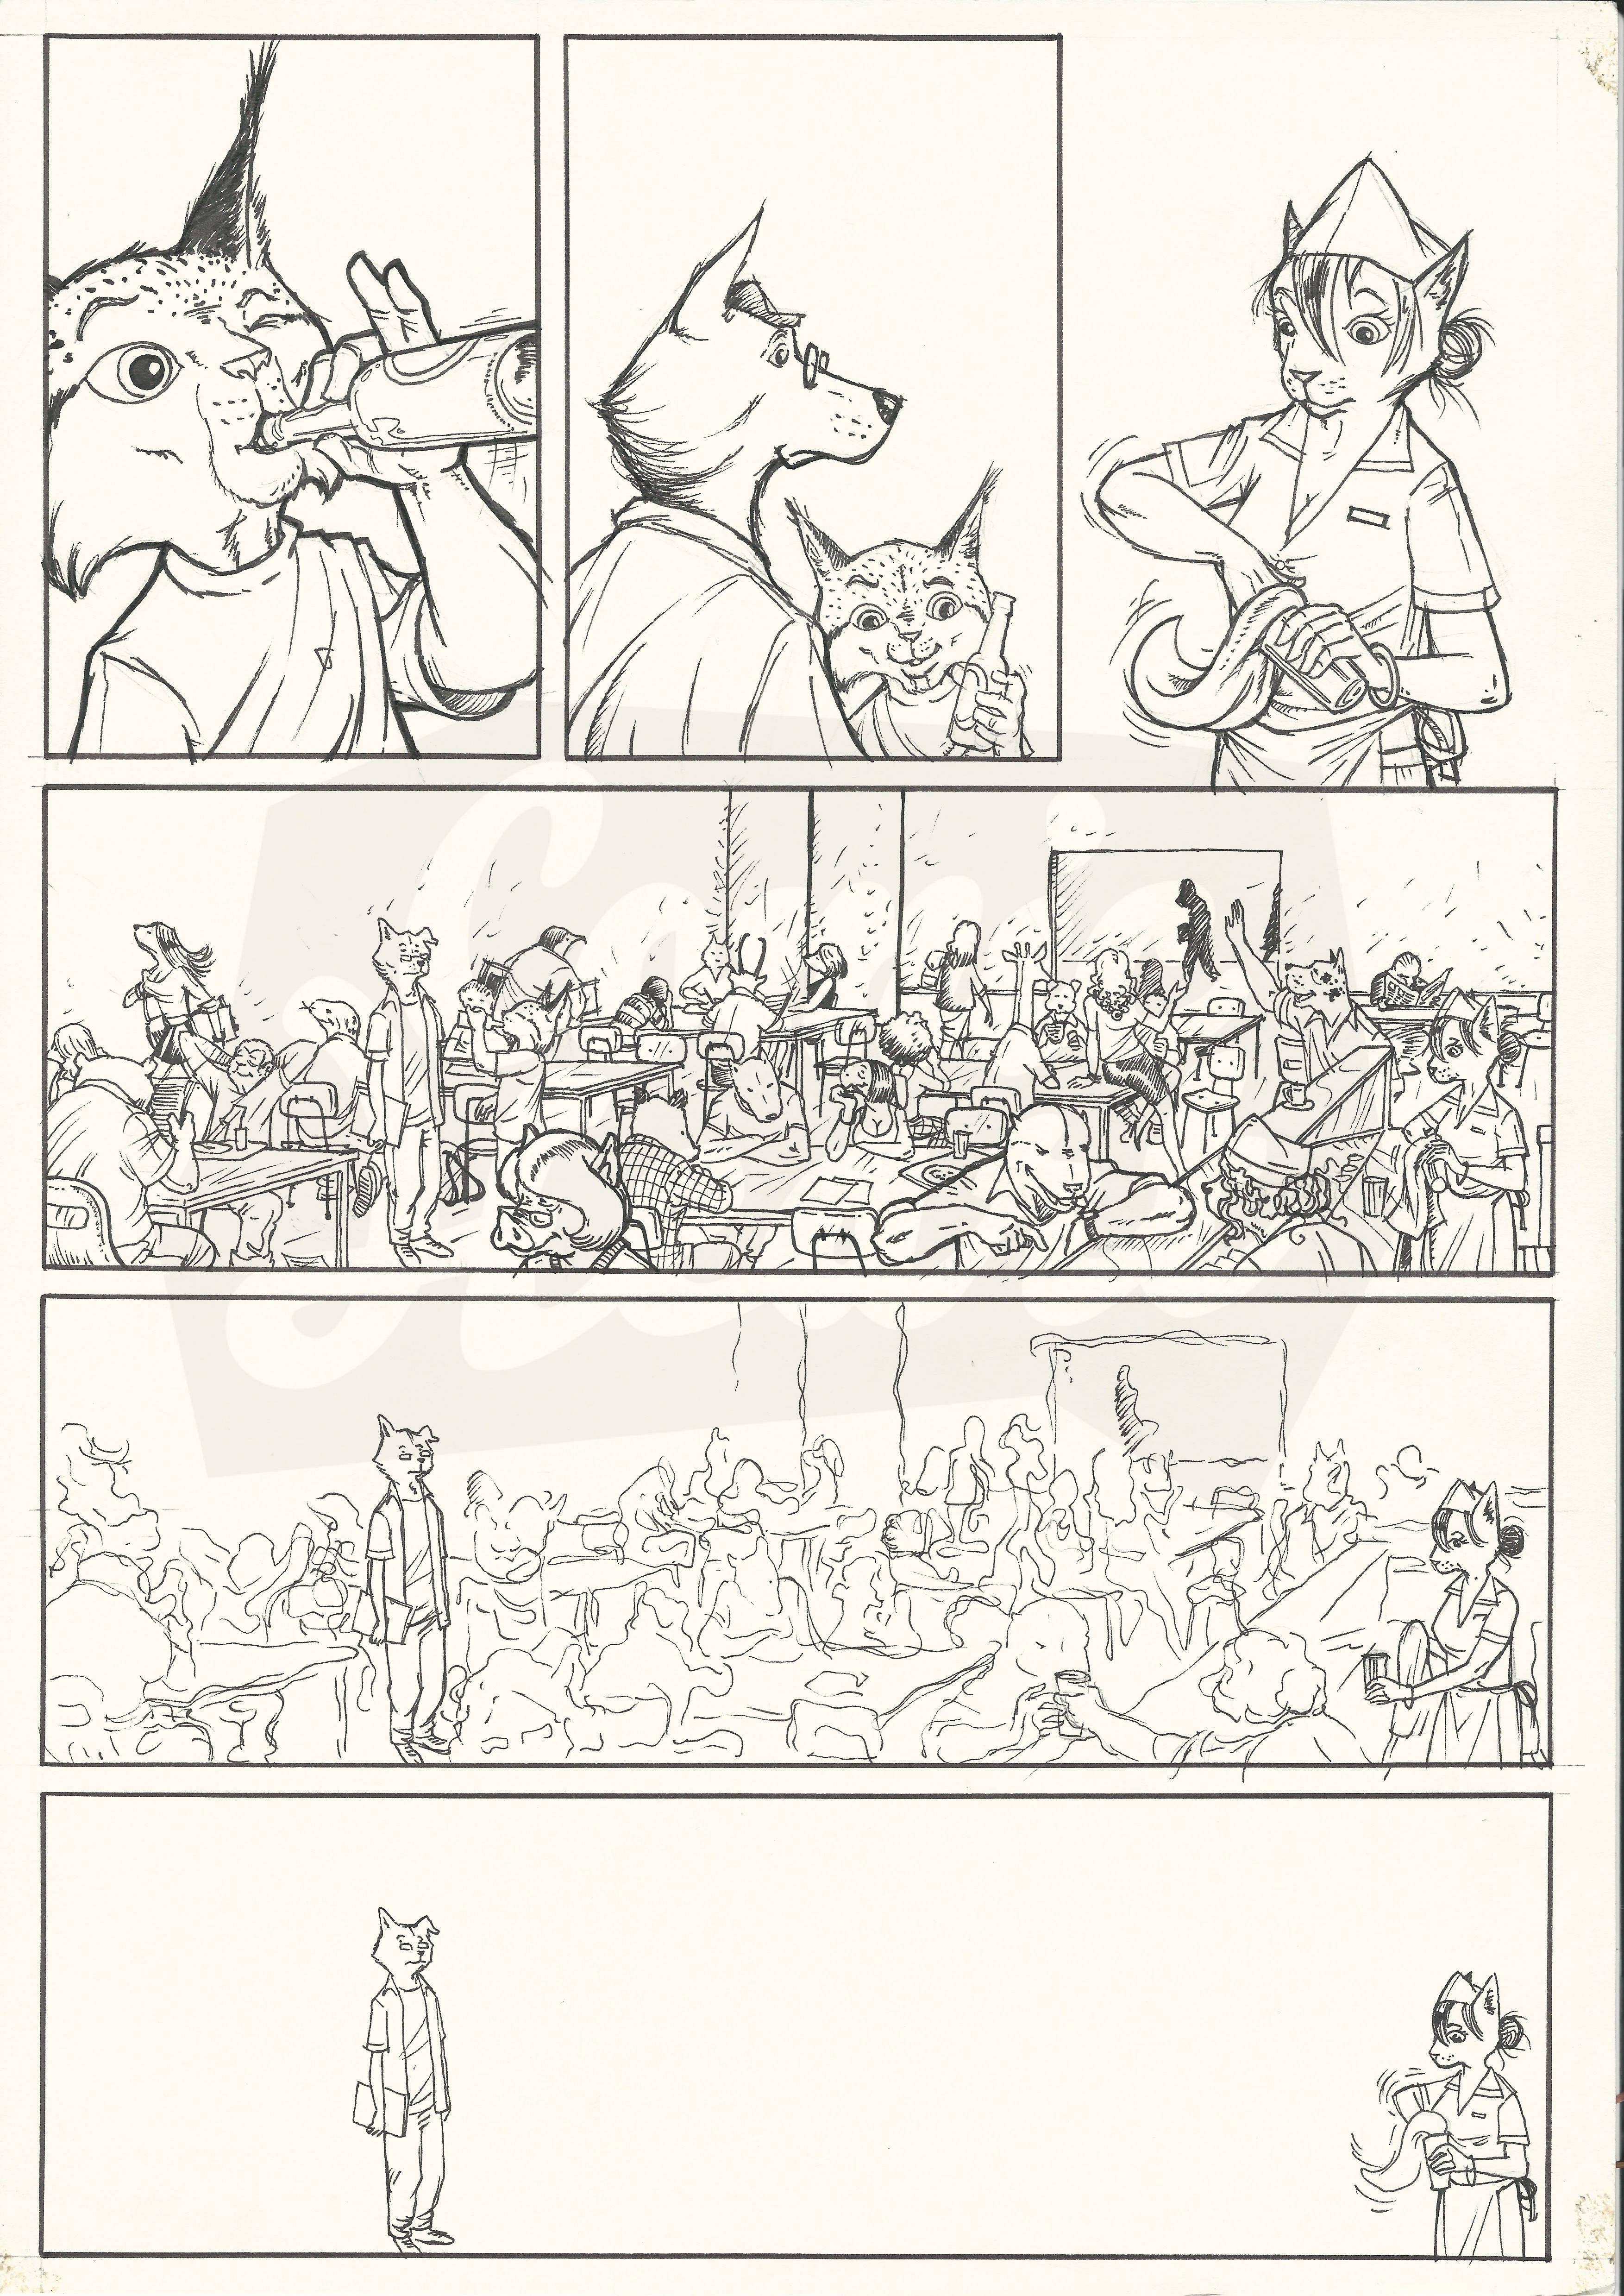 Fórmula da Felicidade Vol.1, Page 18